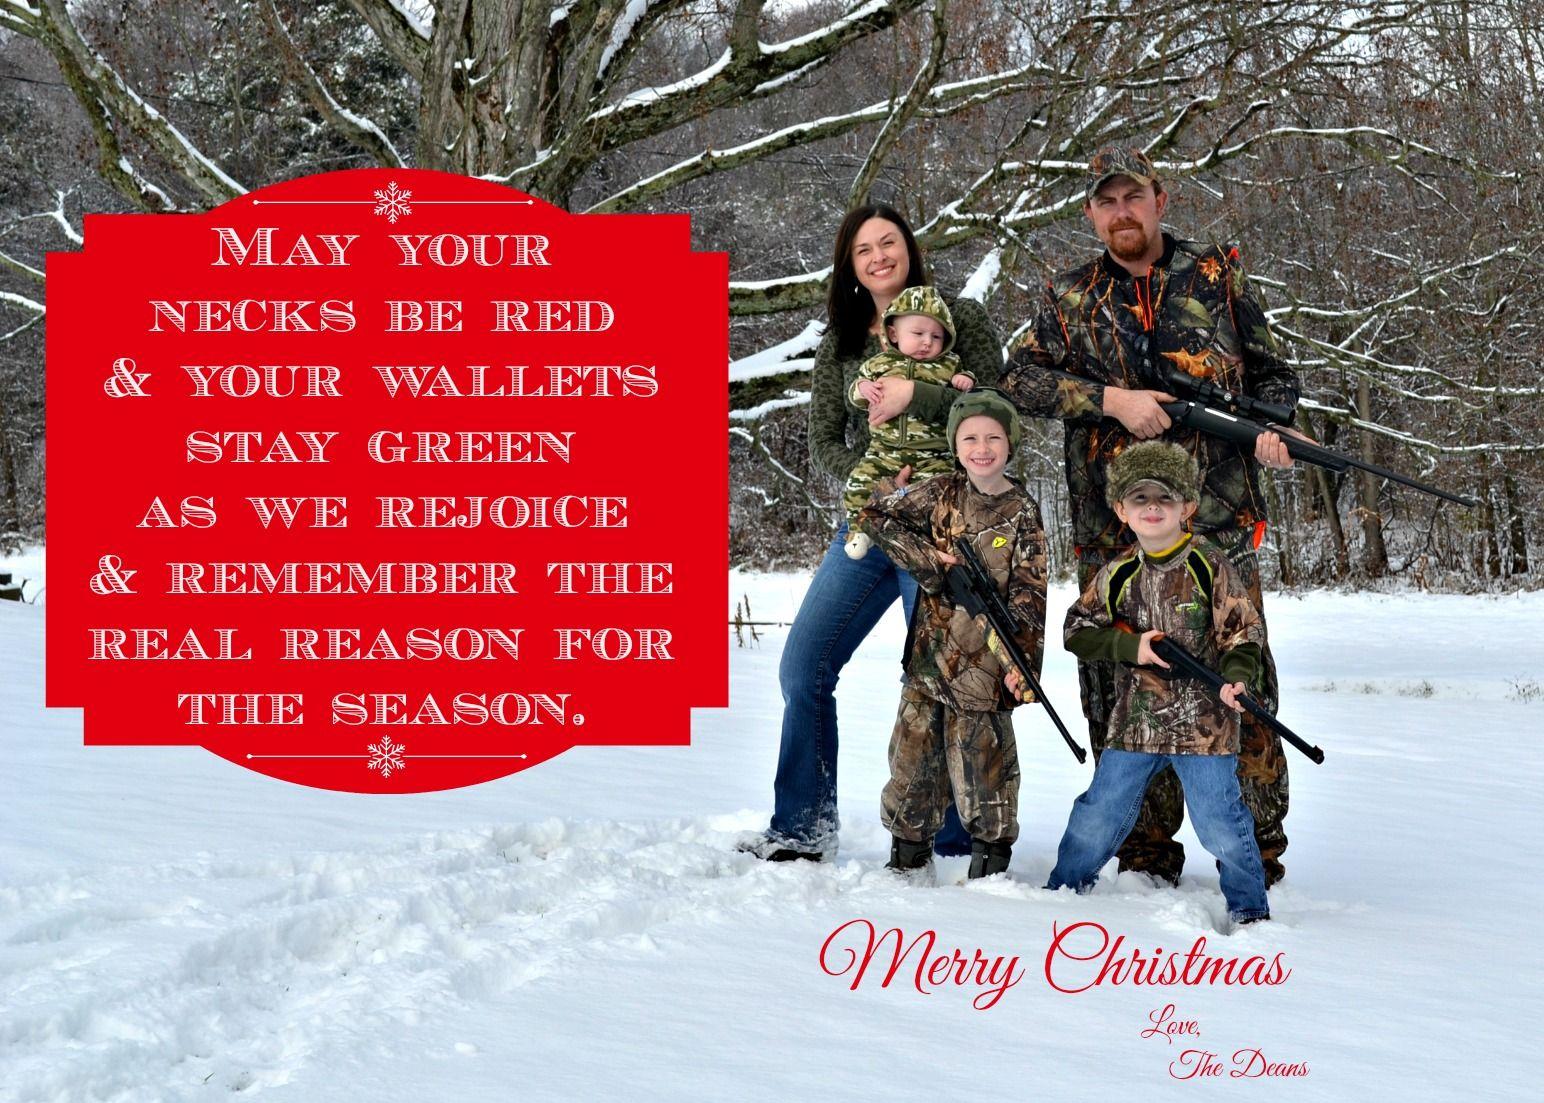 redneck family Christmas card, funny Christmas card, redneck ...